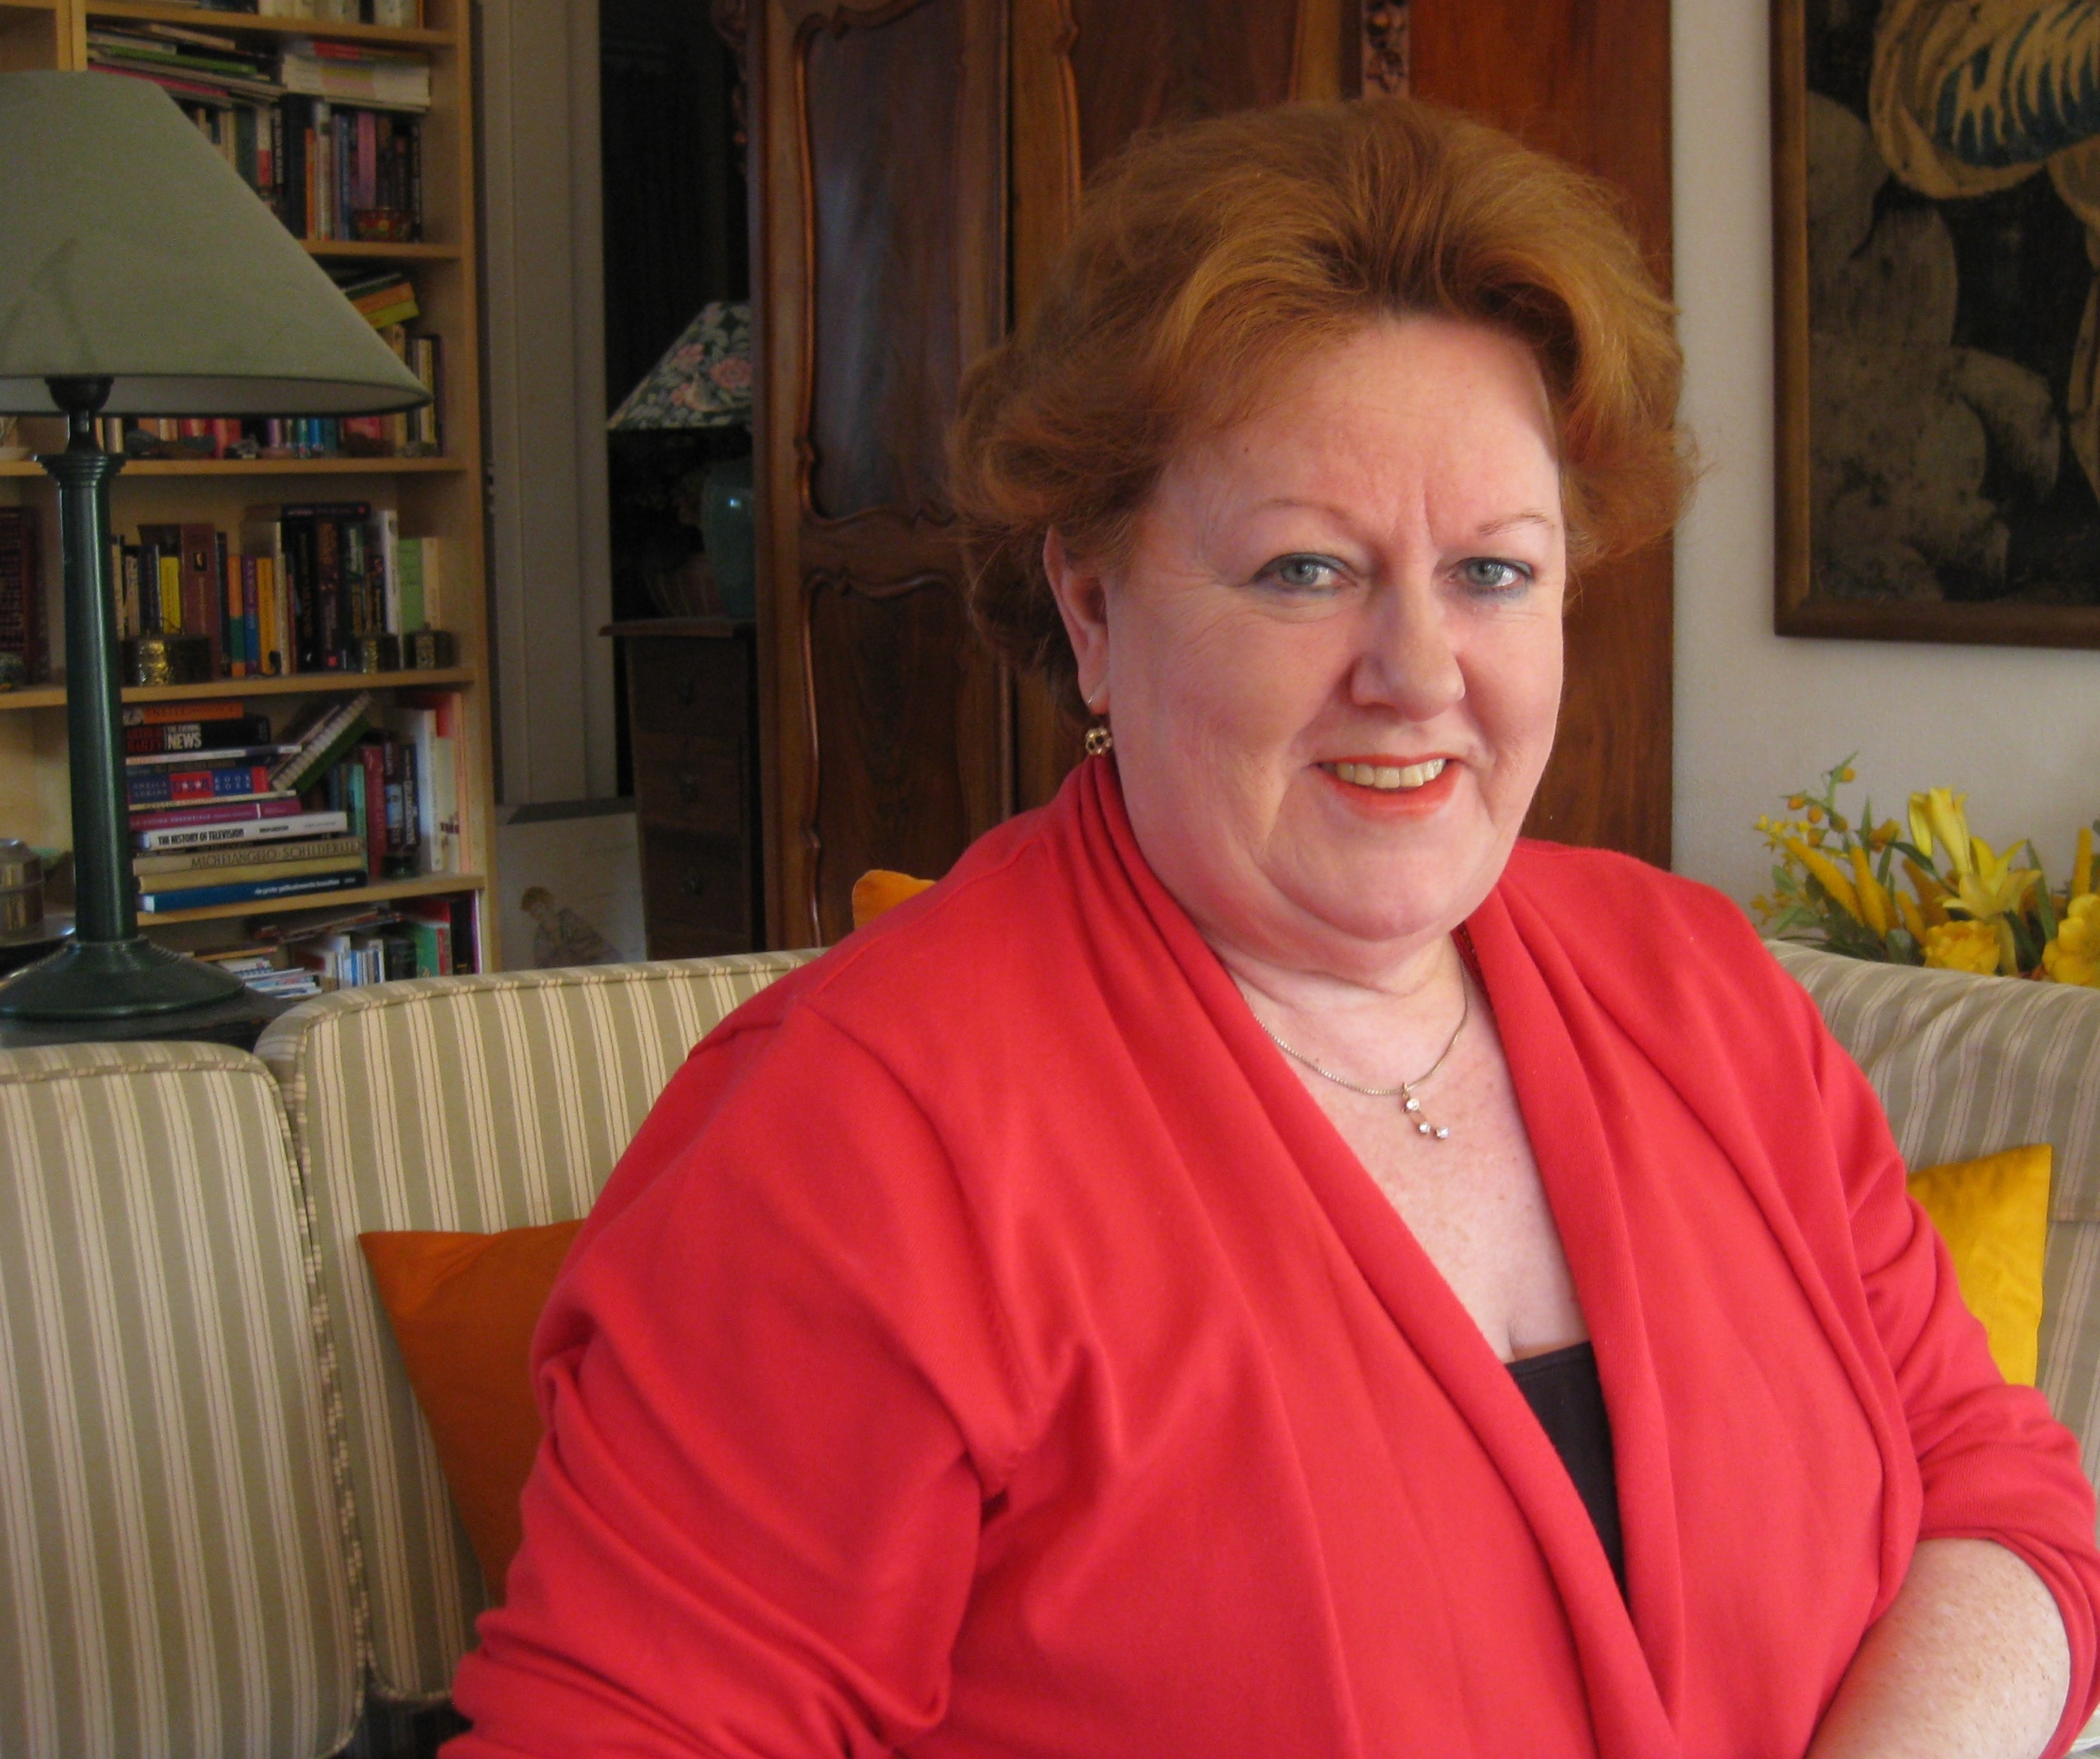 Sigrid van der Linden